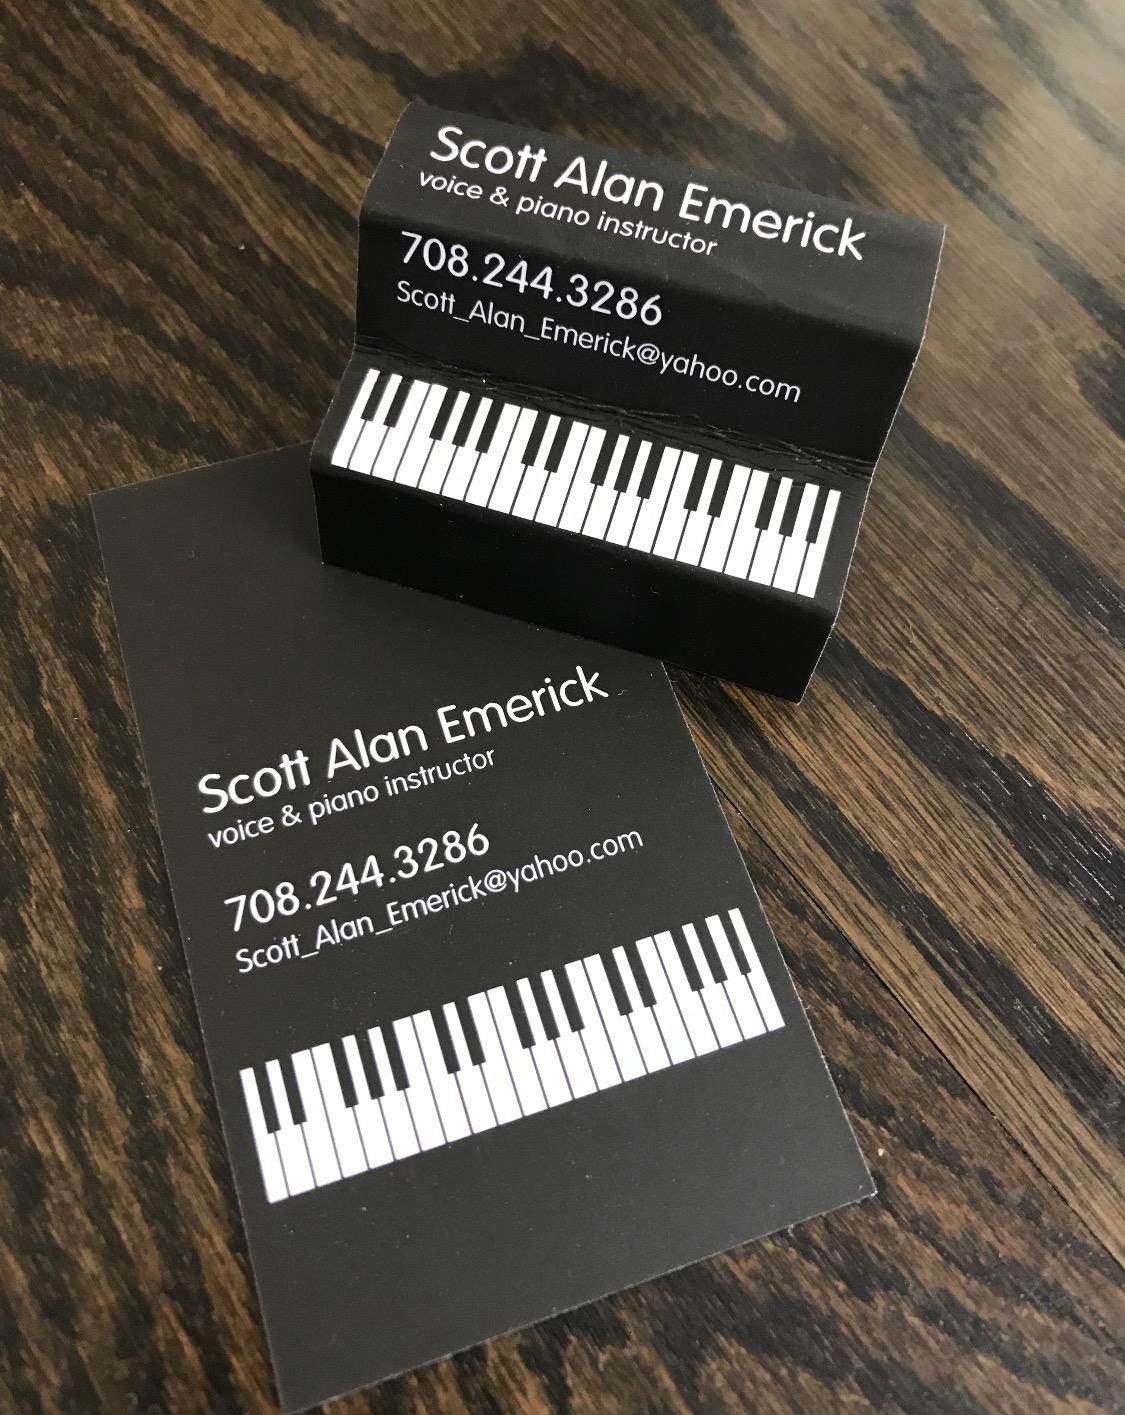 Scott Emerick